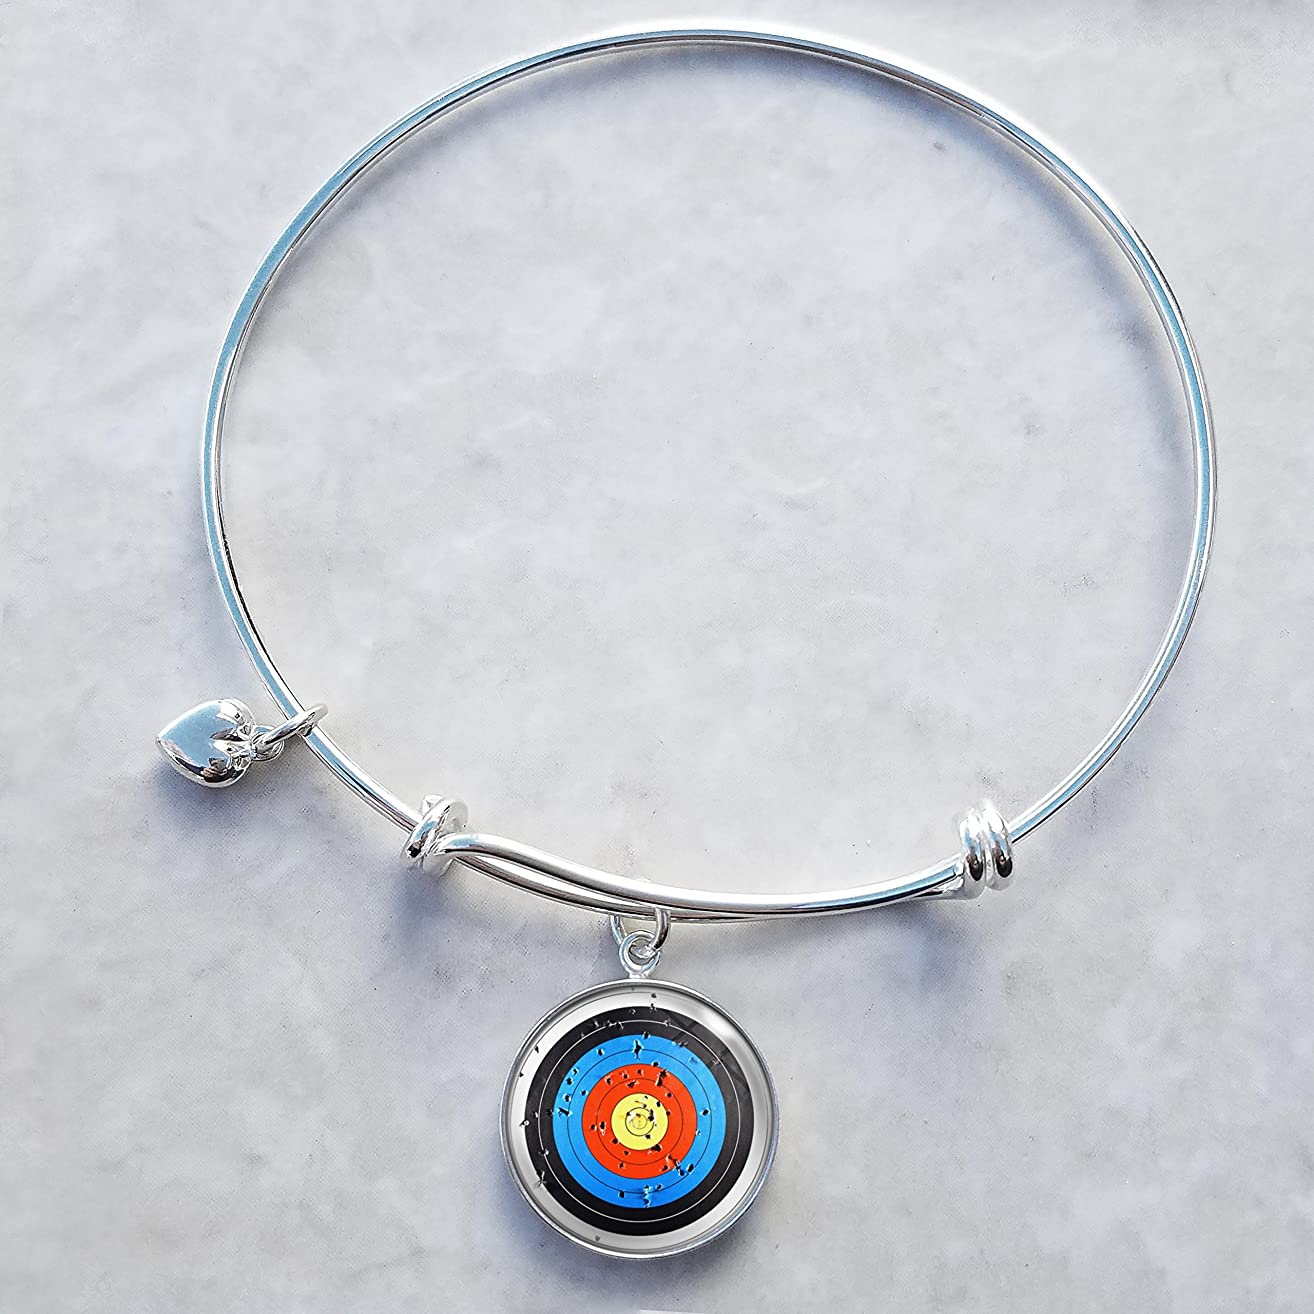 Archery Target Sterling Silver Expandable Wire Bangle Charm Bracelet